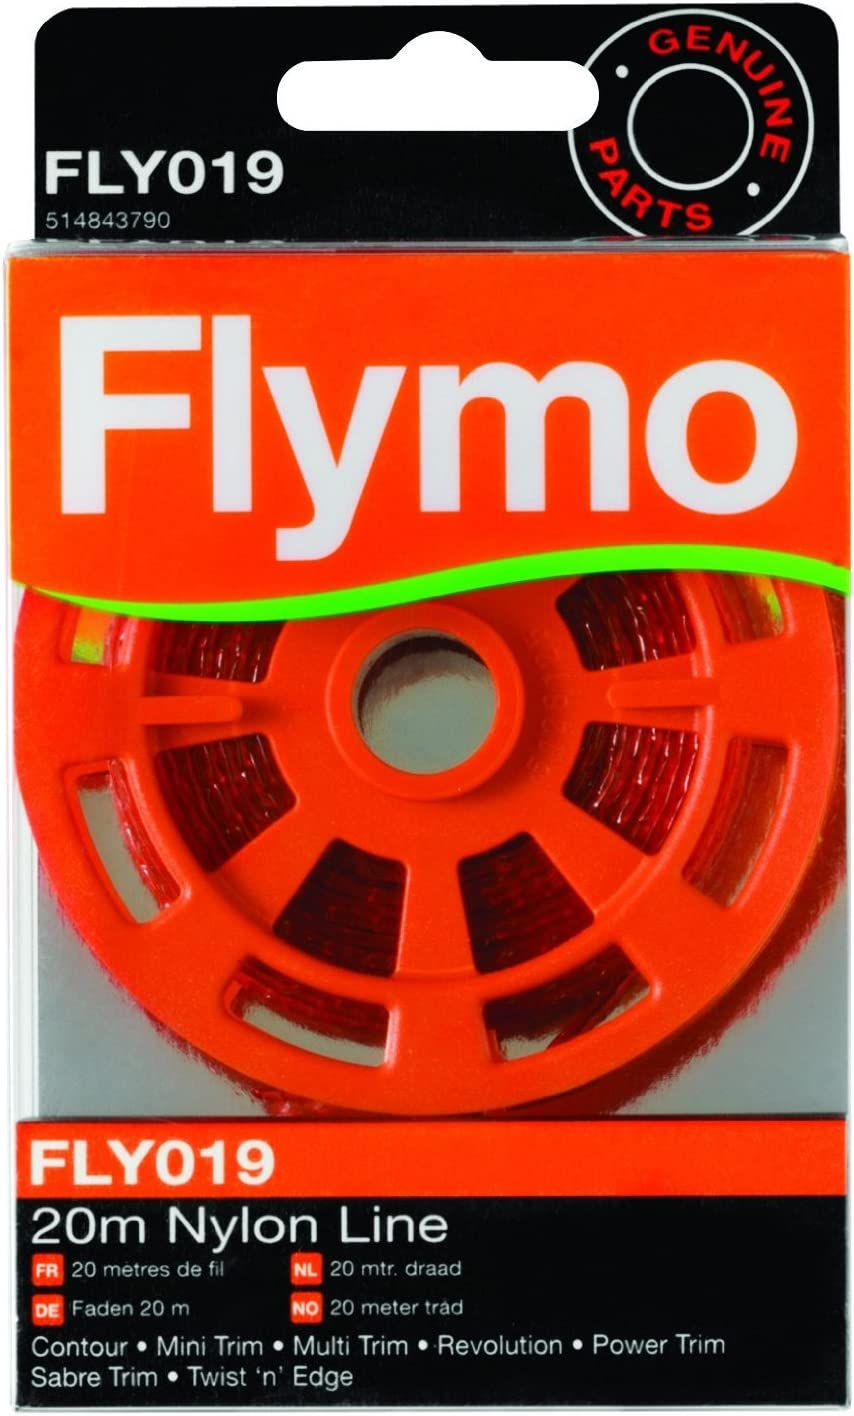 Flymo FLY019 - Hilo de nailon para cortacéspedes y cortasetos